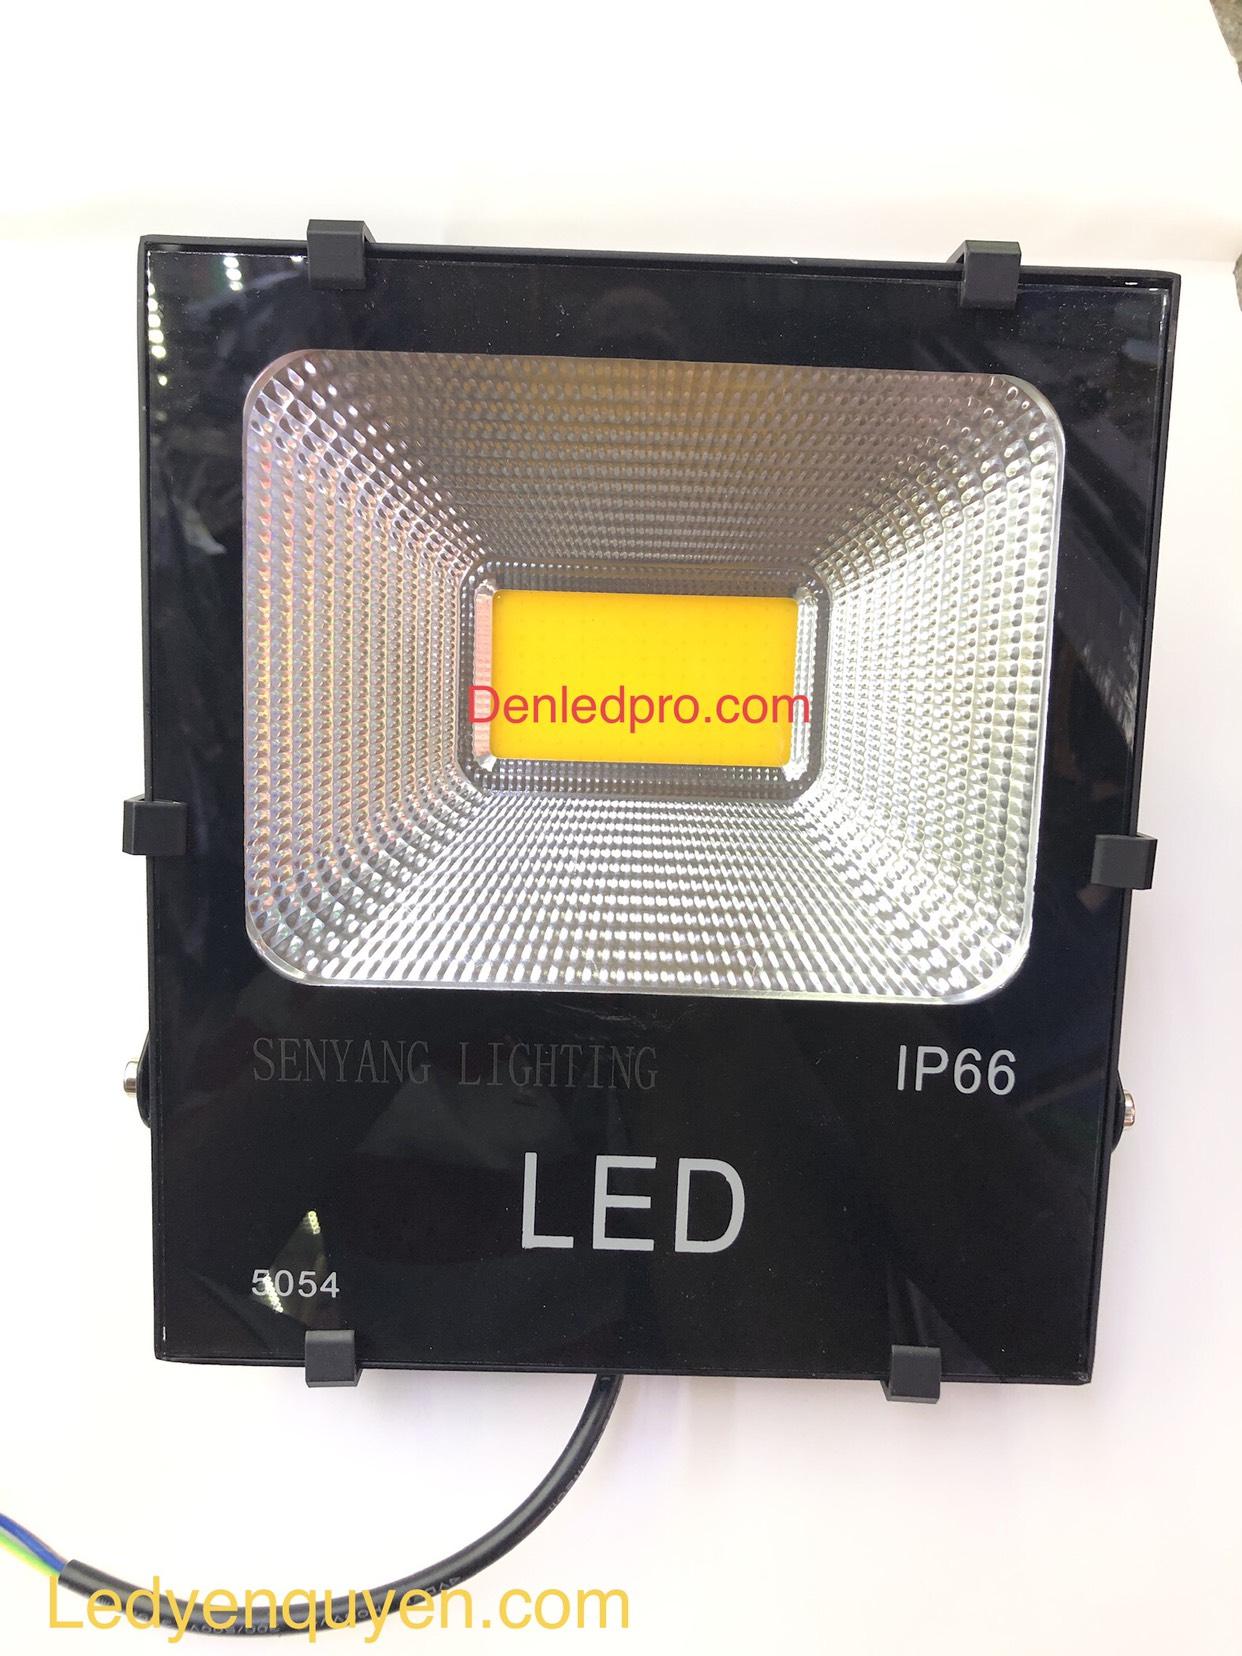 Đèn Pha LED 100W Senyang Light